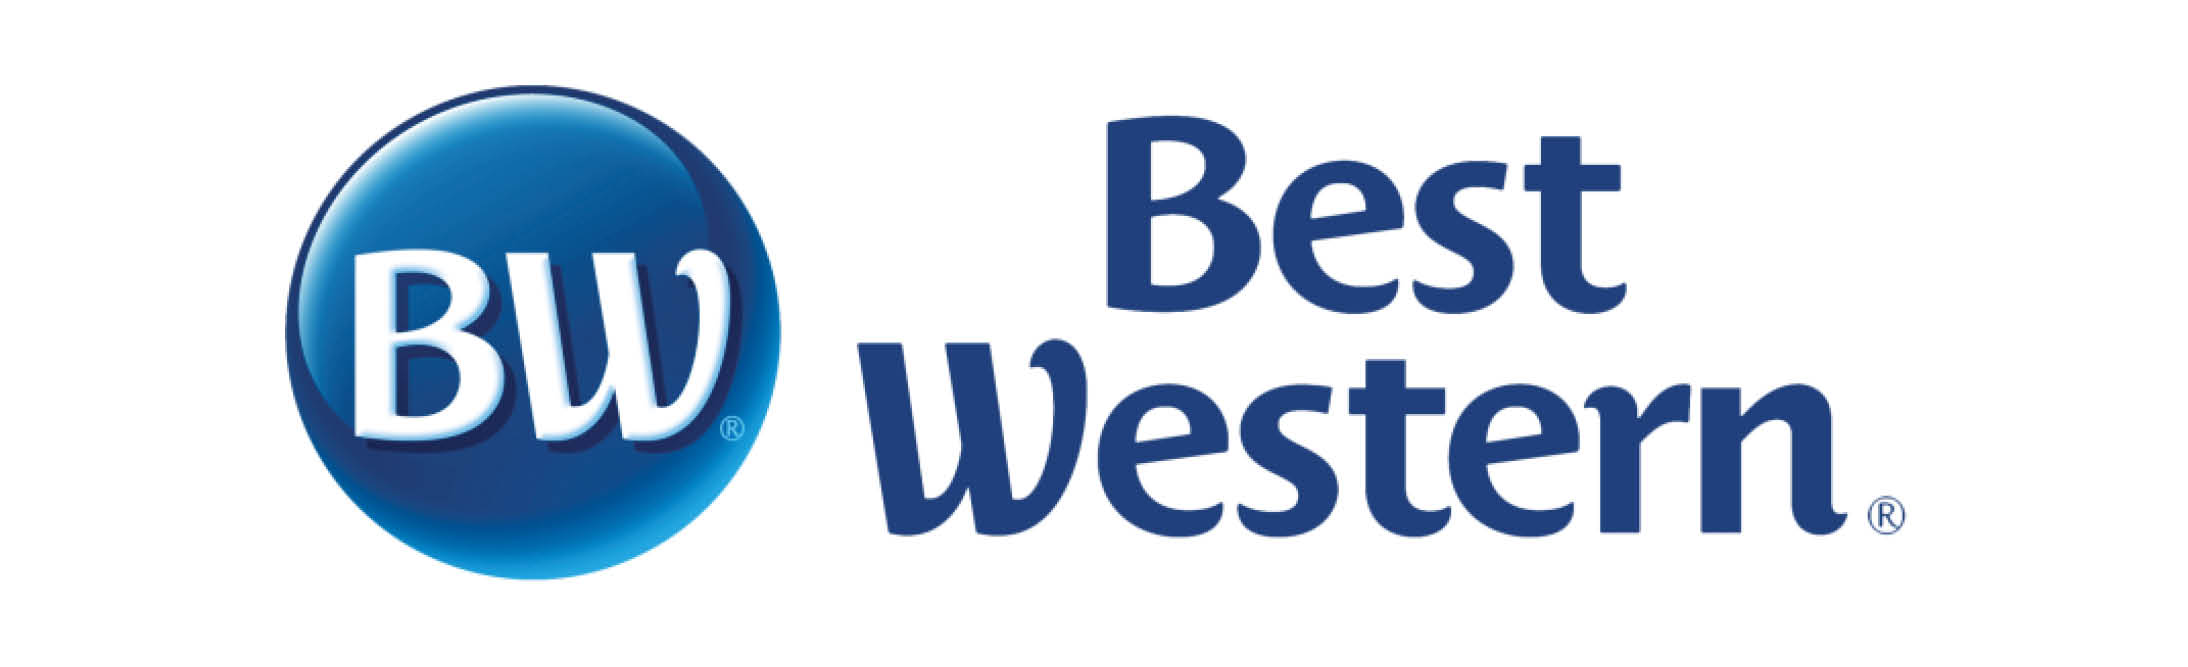 Best Western-Mix Logo.jpg